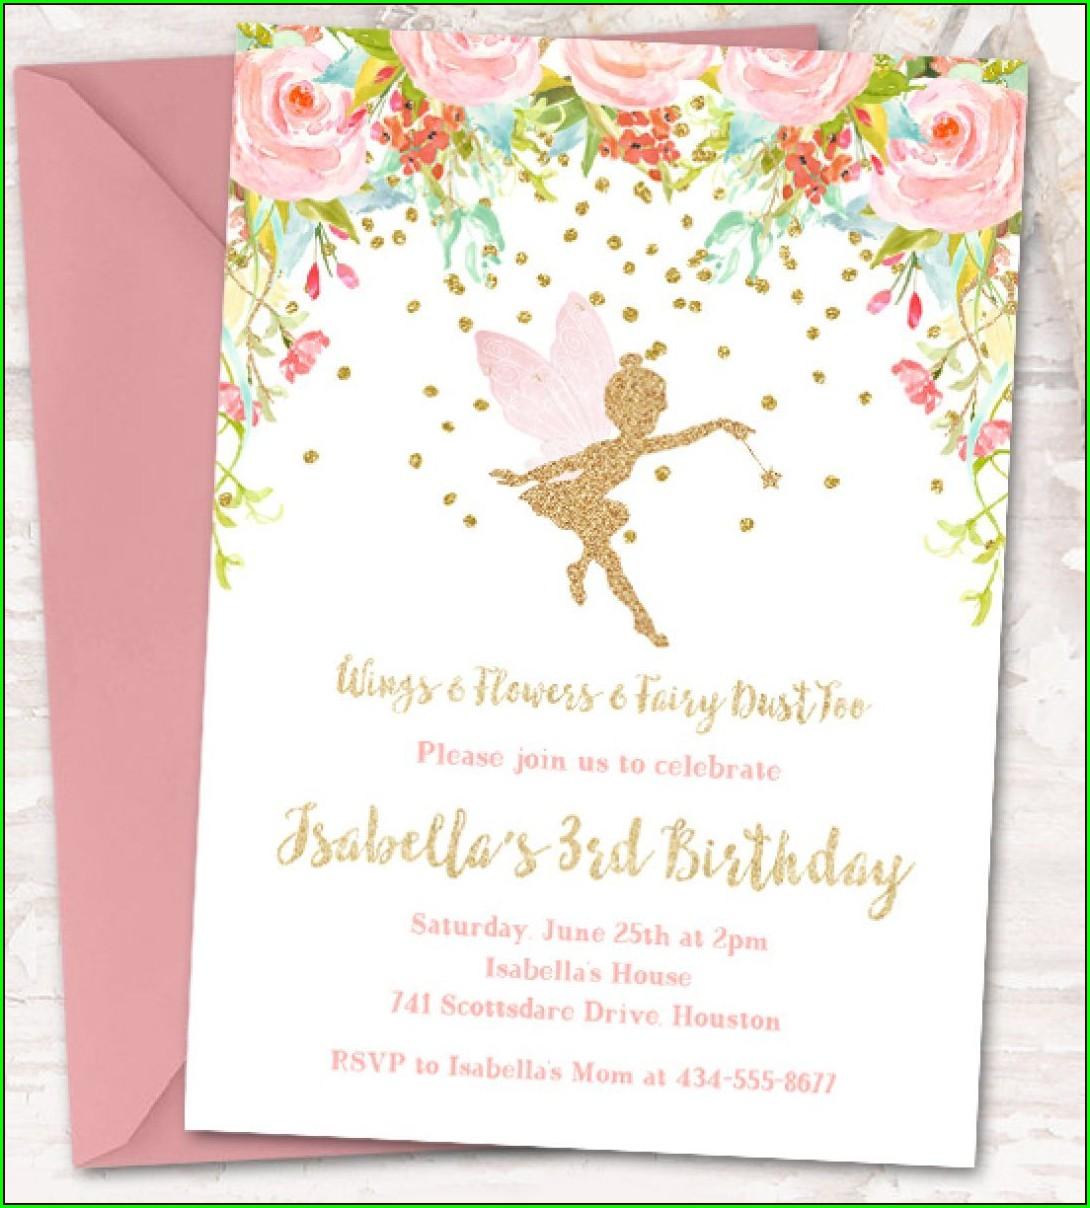 Downloadable 5th Birthday Invitation Templates